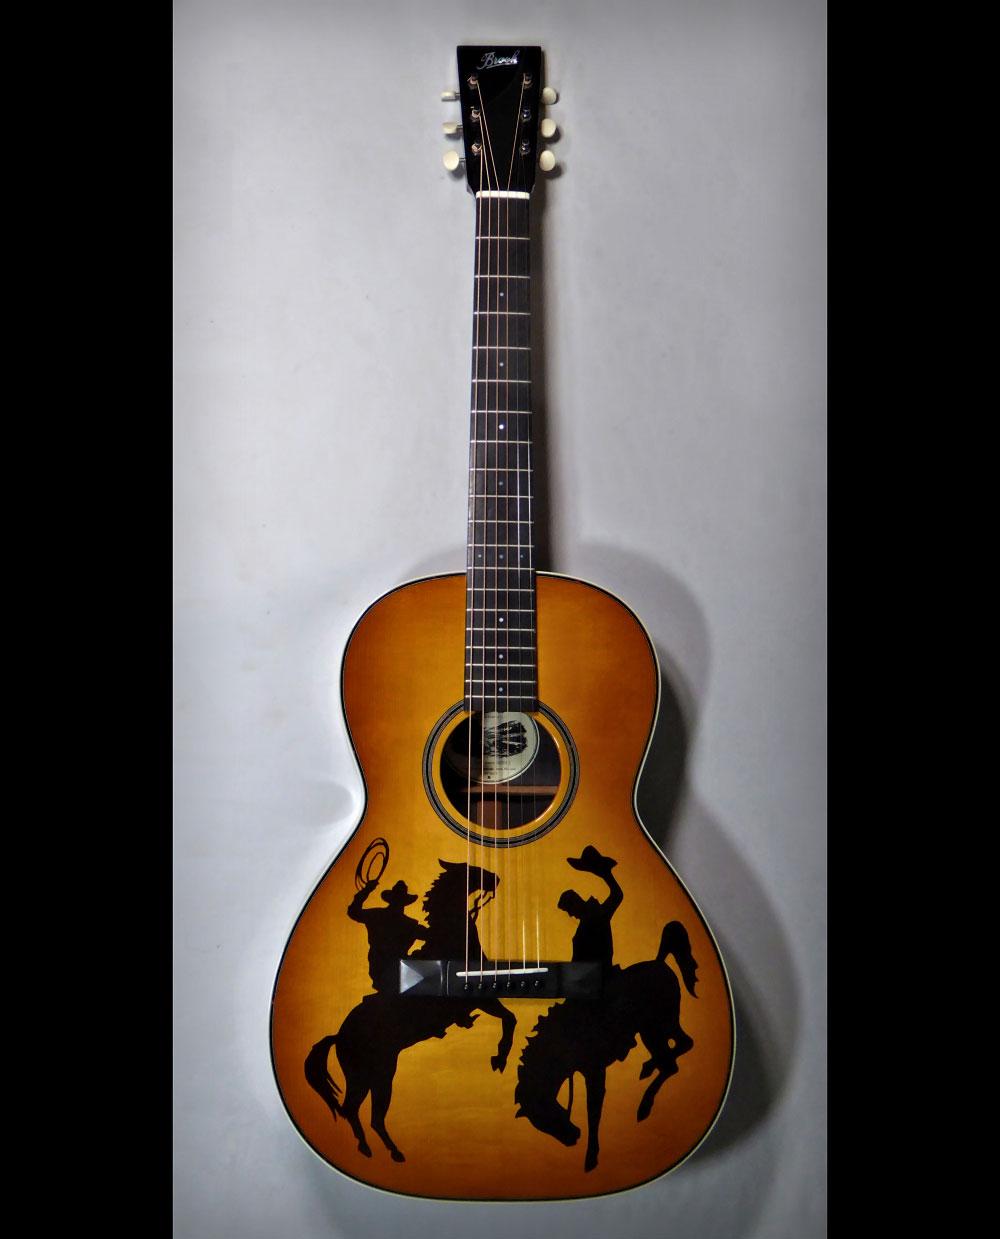 Brook Cowboy Guitar full length